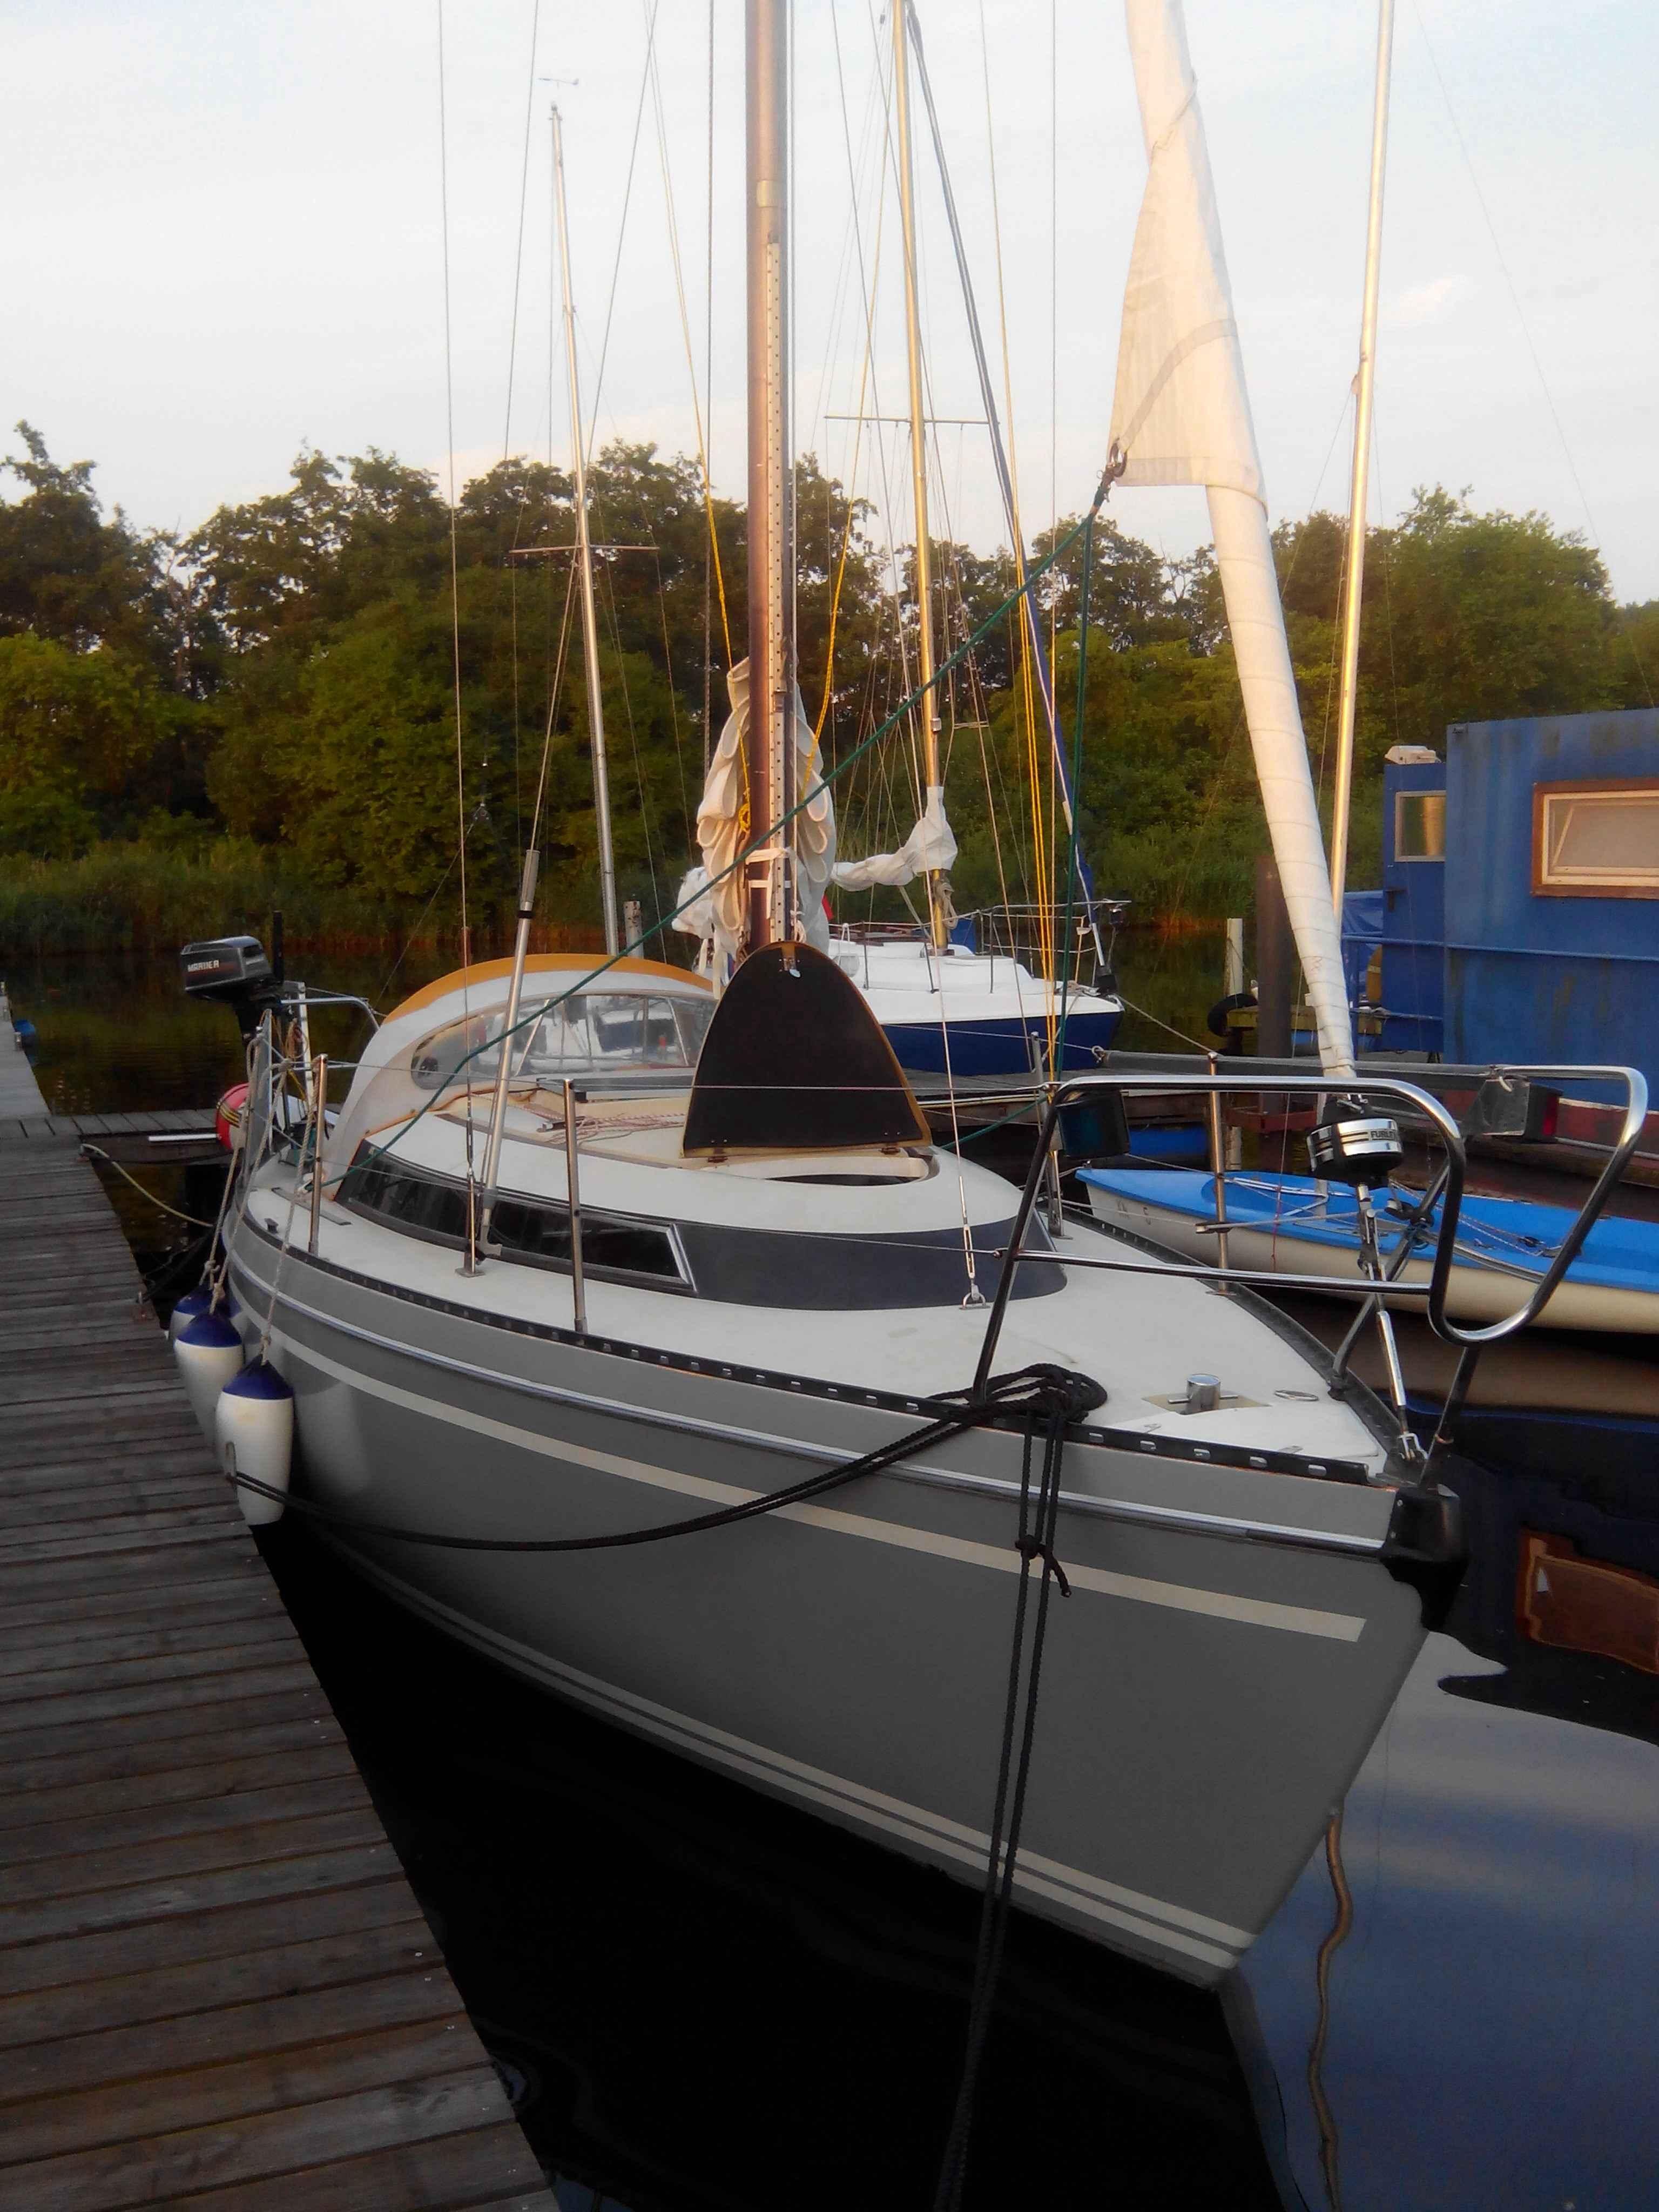 Segelboot Friendship 28 LP Wilhelmshaven (Nordsee/Jadebusen)